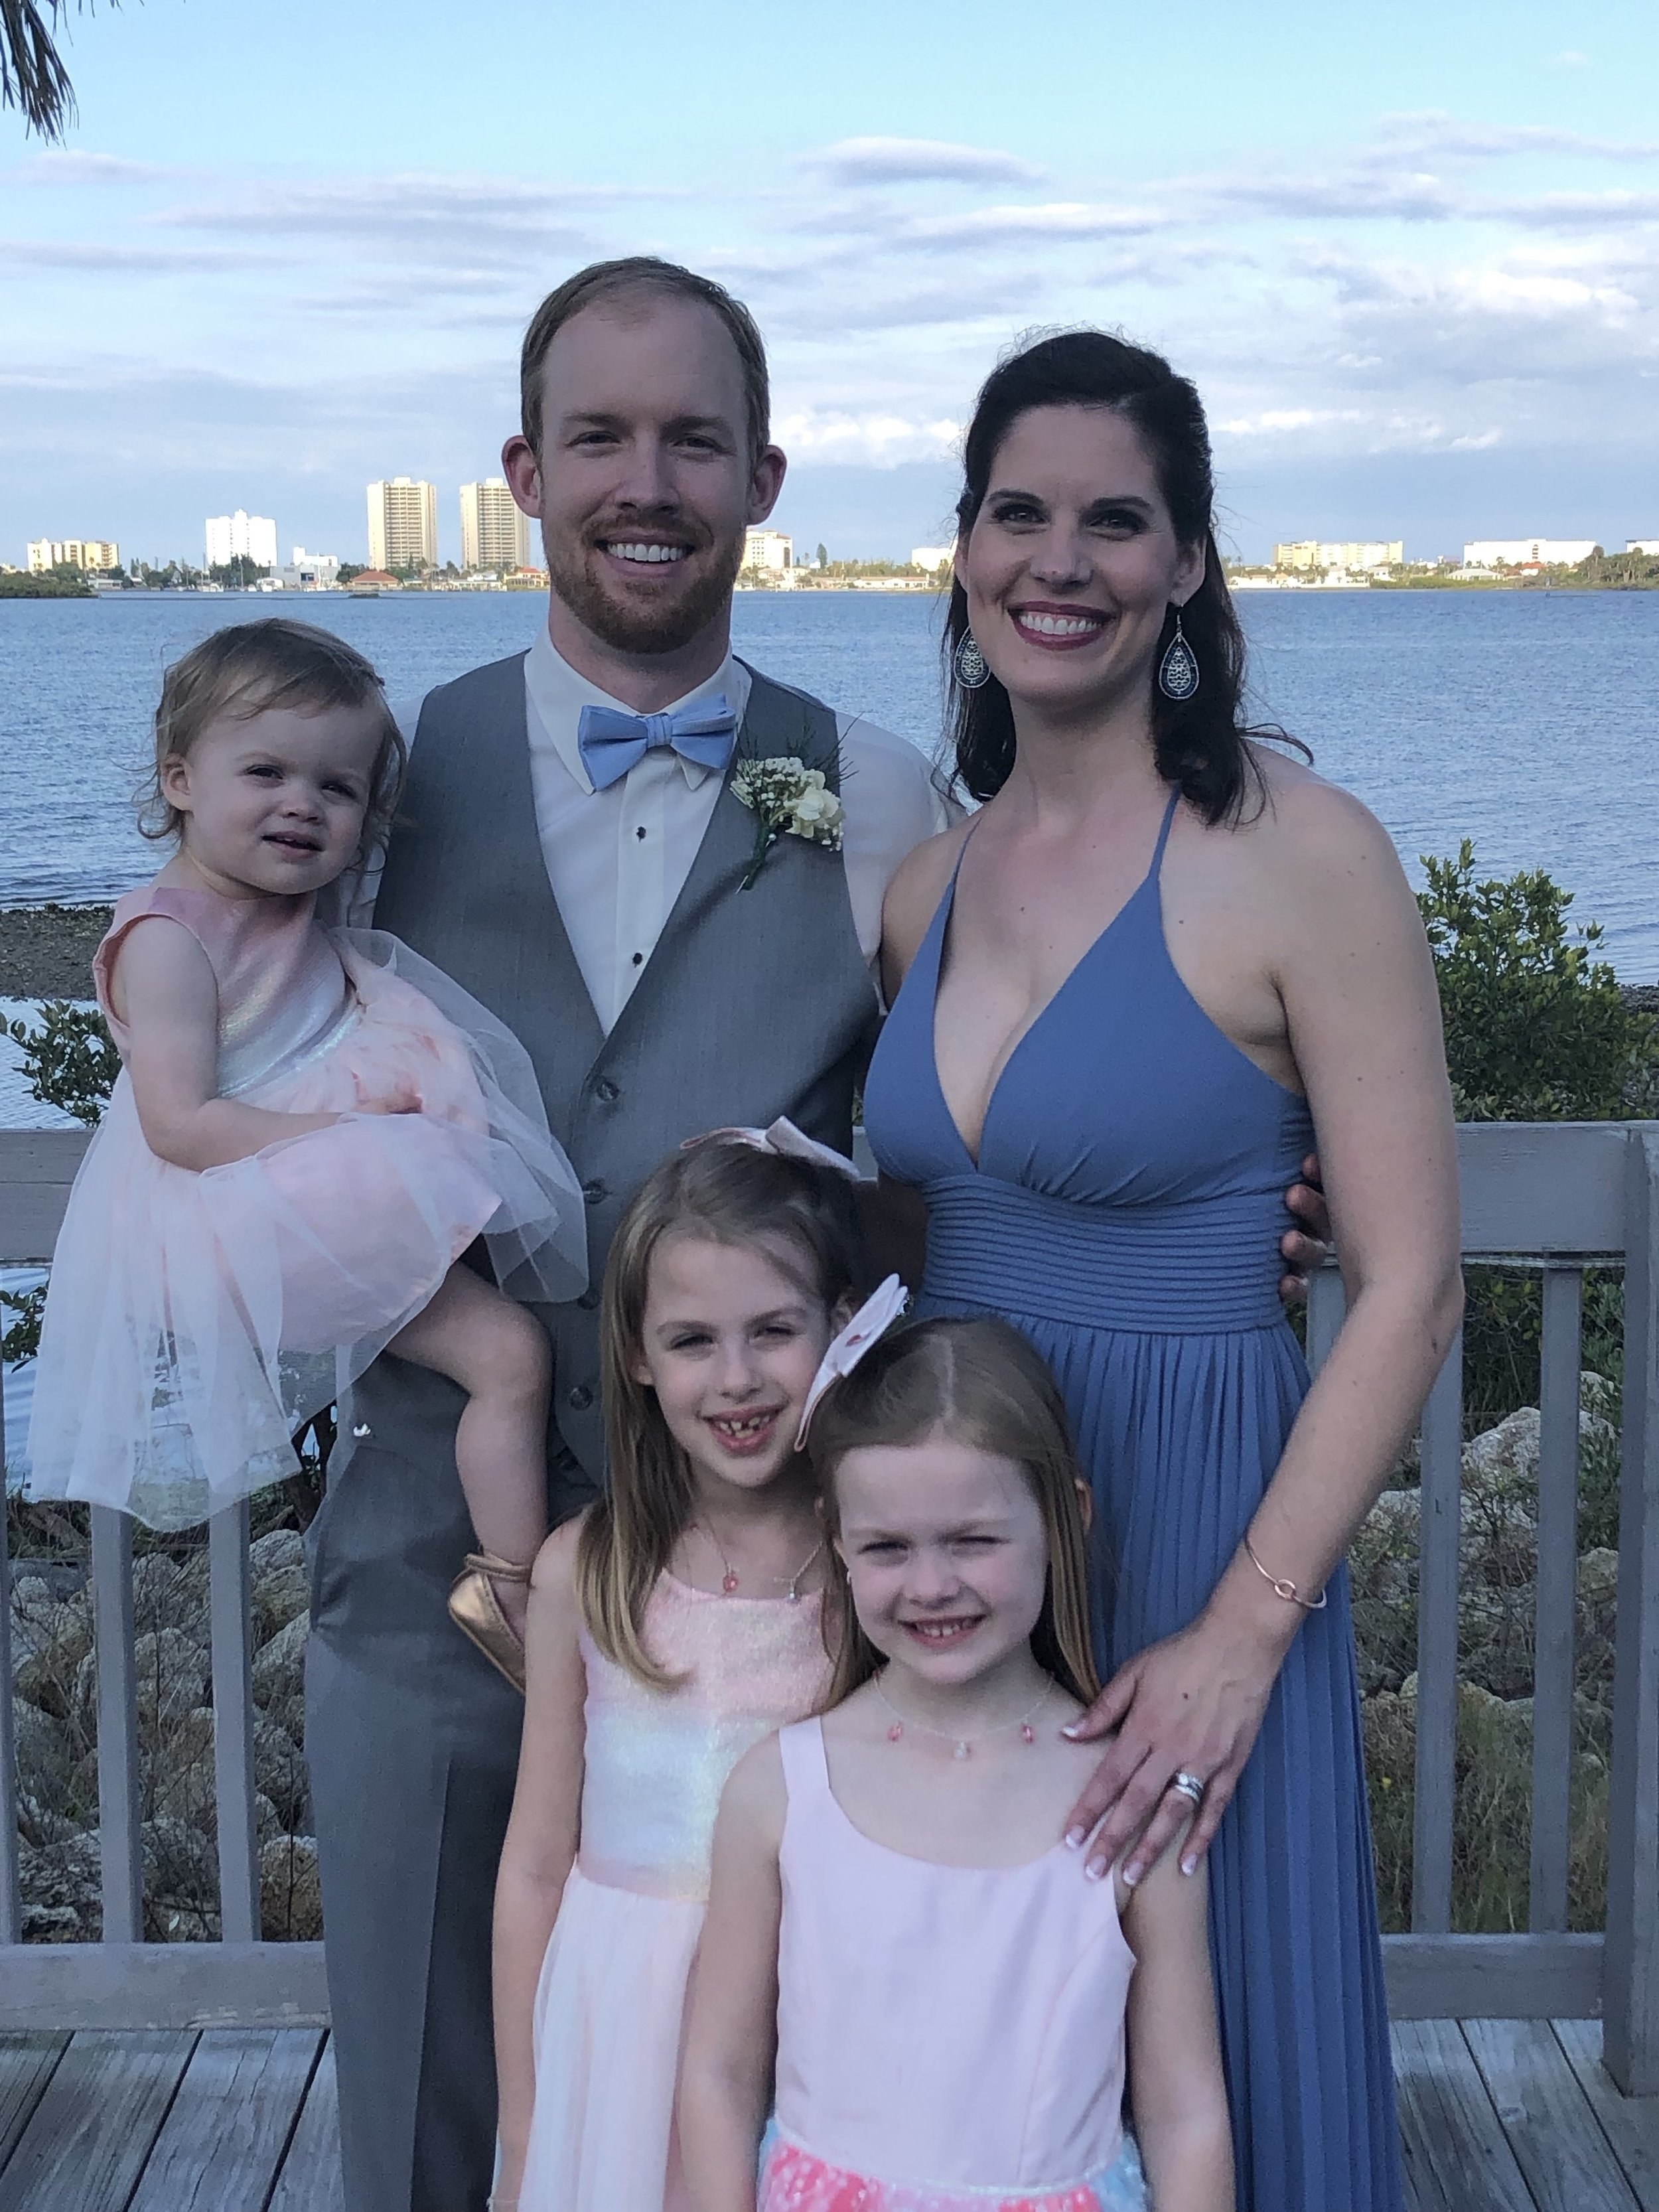 Wedding in Daytona Beach, Fl April 2019